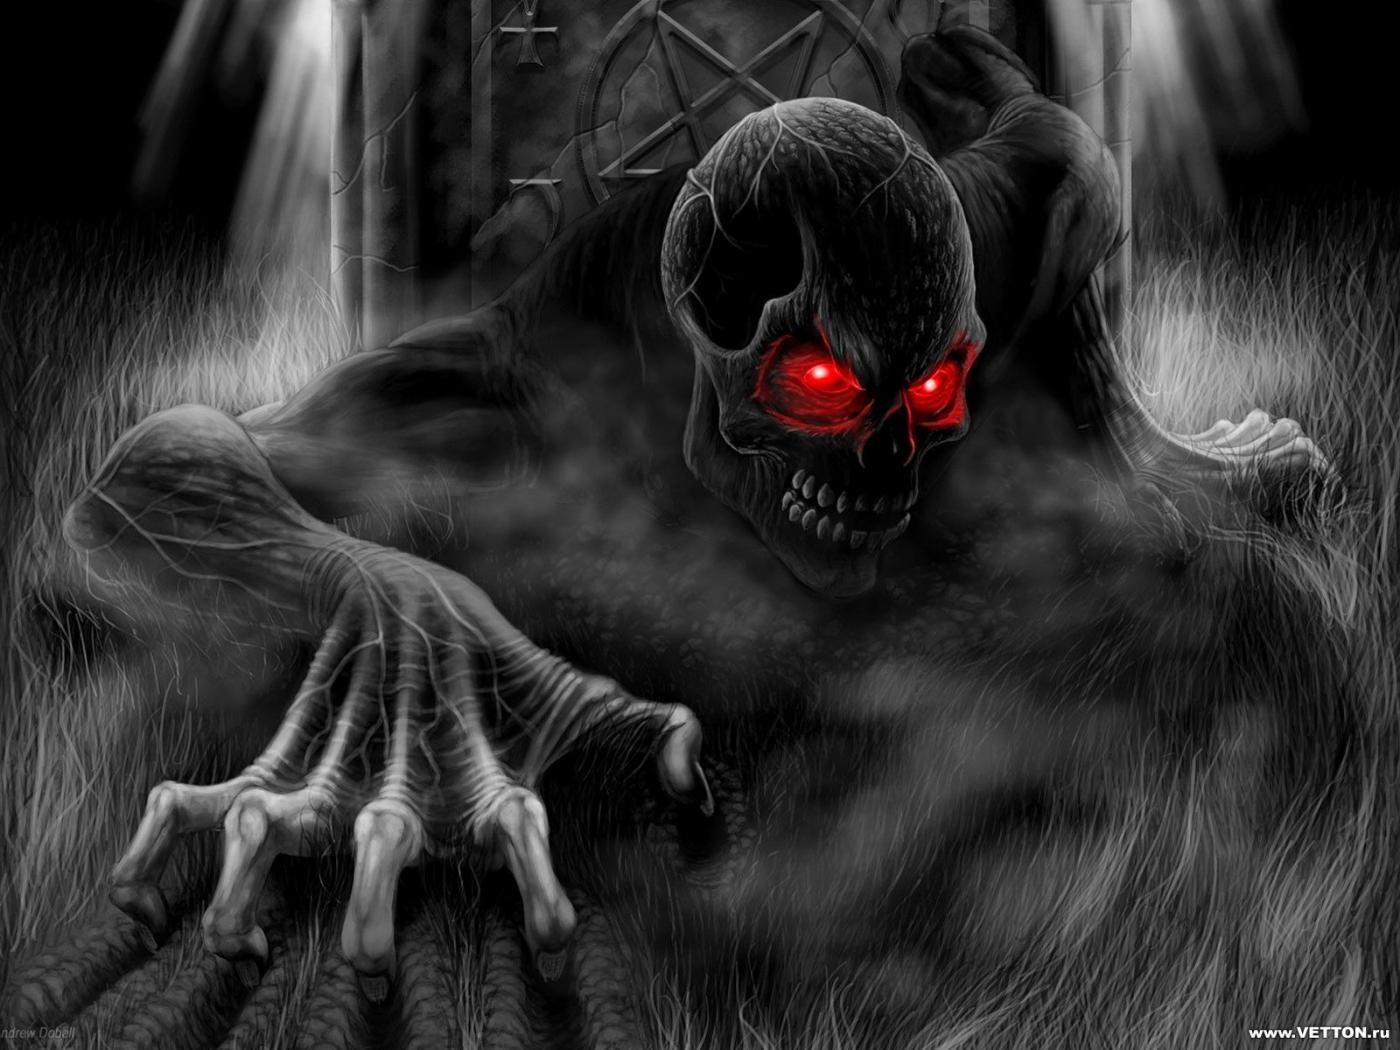 http://3.bp.blogspot.com/-3c8ch1e-YQk/TkW73sZM5WI/AAAAAAAAAX8/4xG0jRhCHV8/s1600/death-hd-wallpaper.jpg